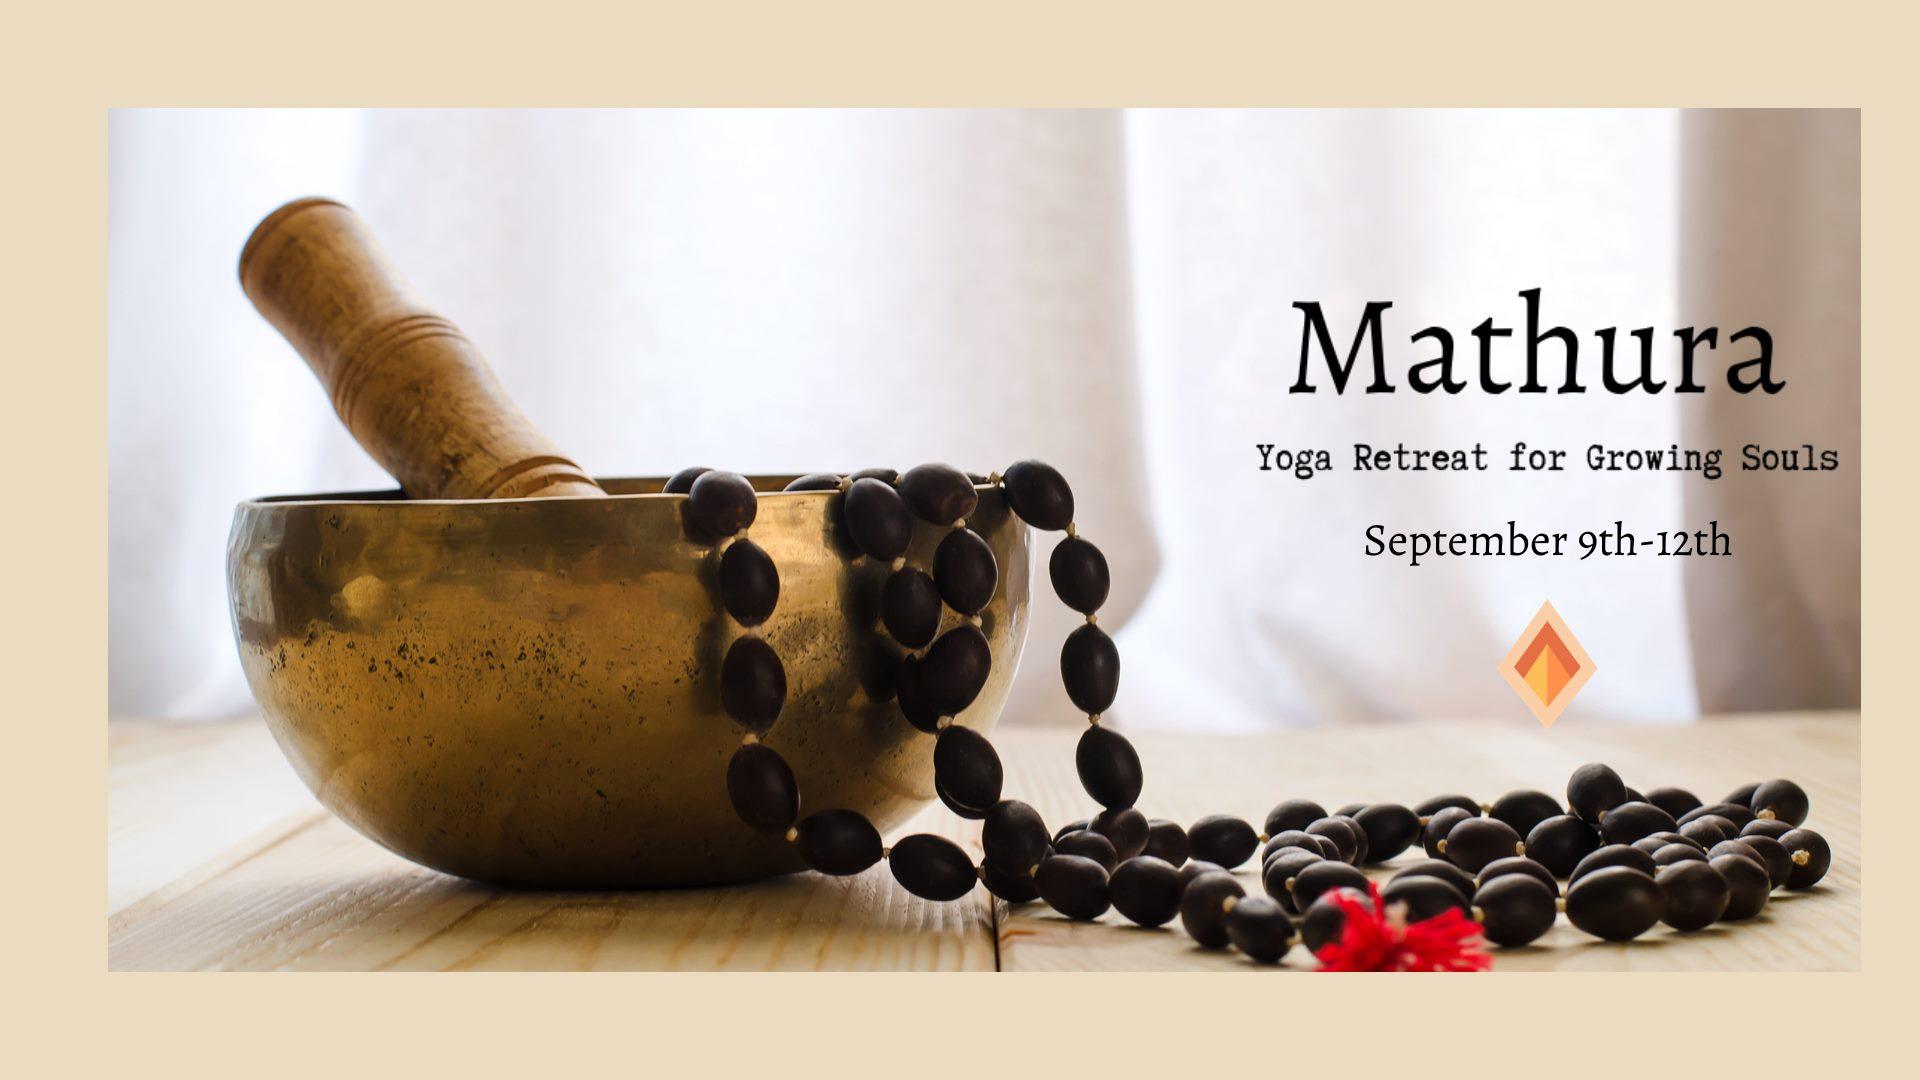 Mathura – Yoga Retreat in a beautiful Italian town